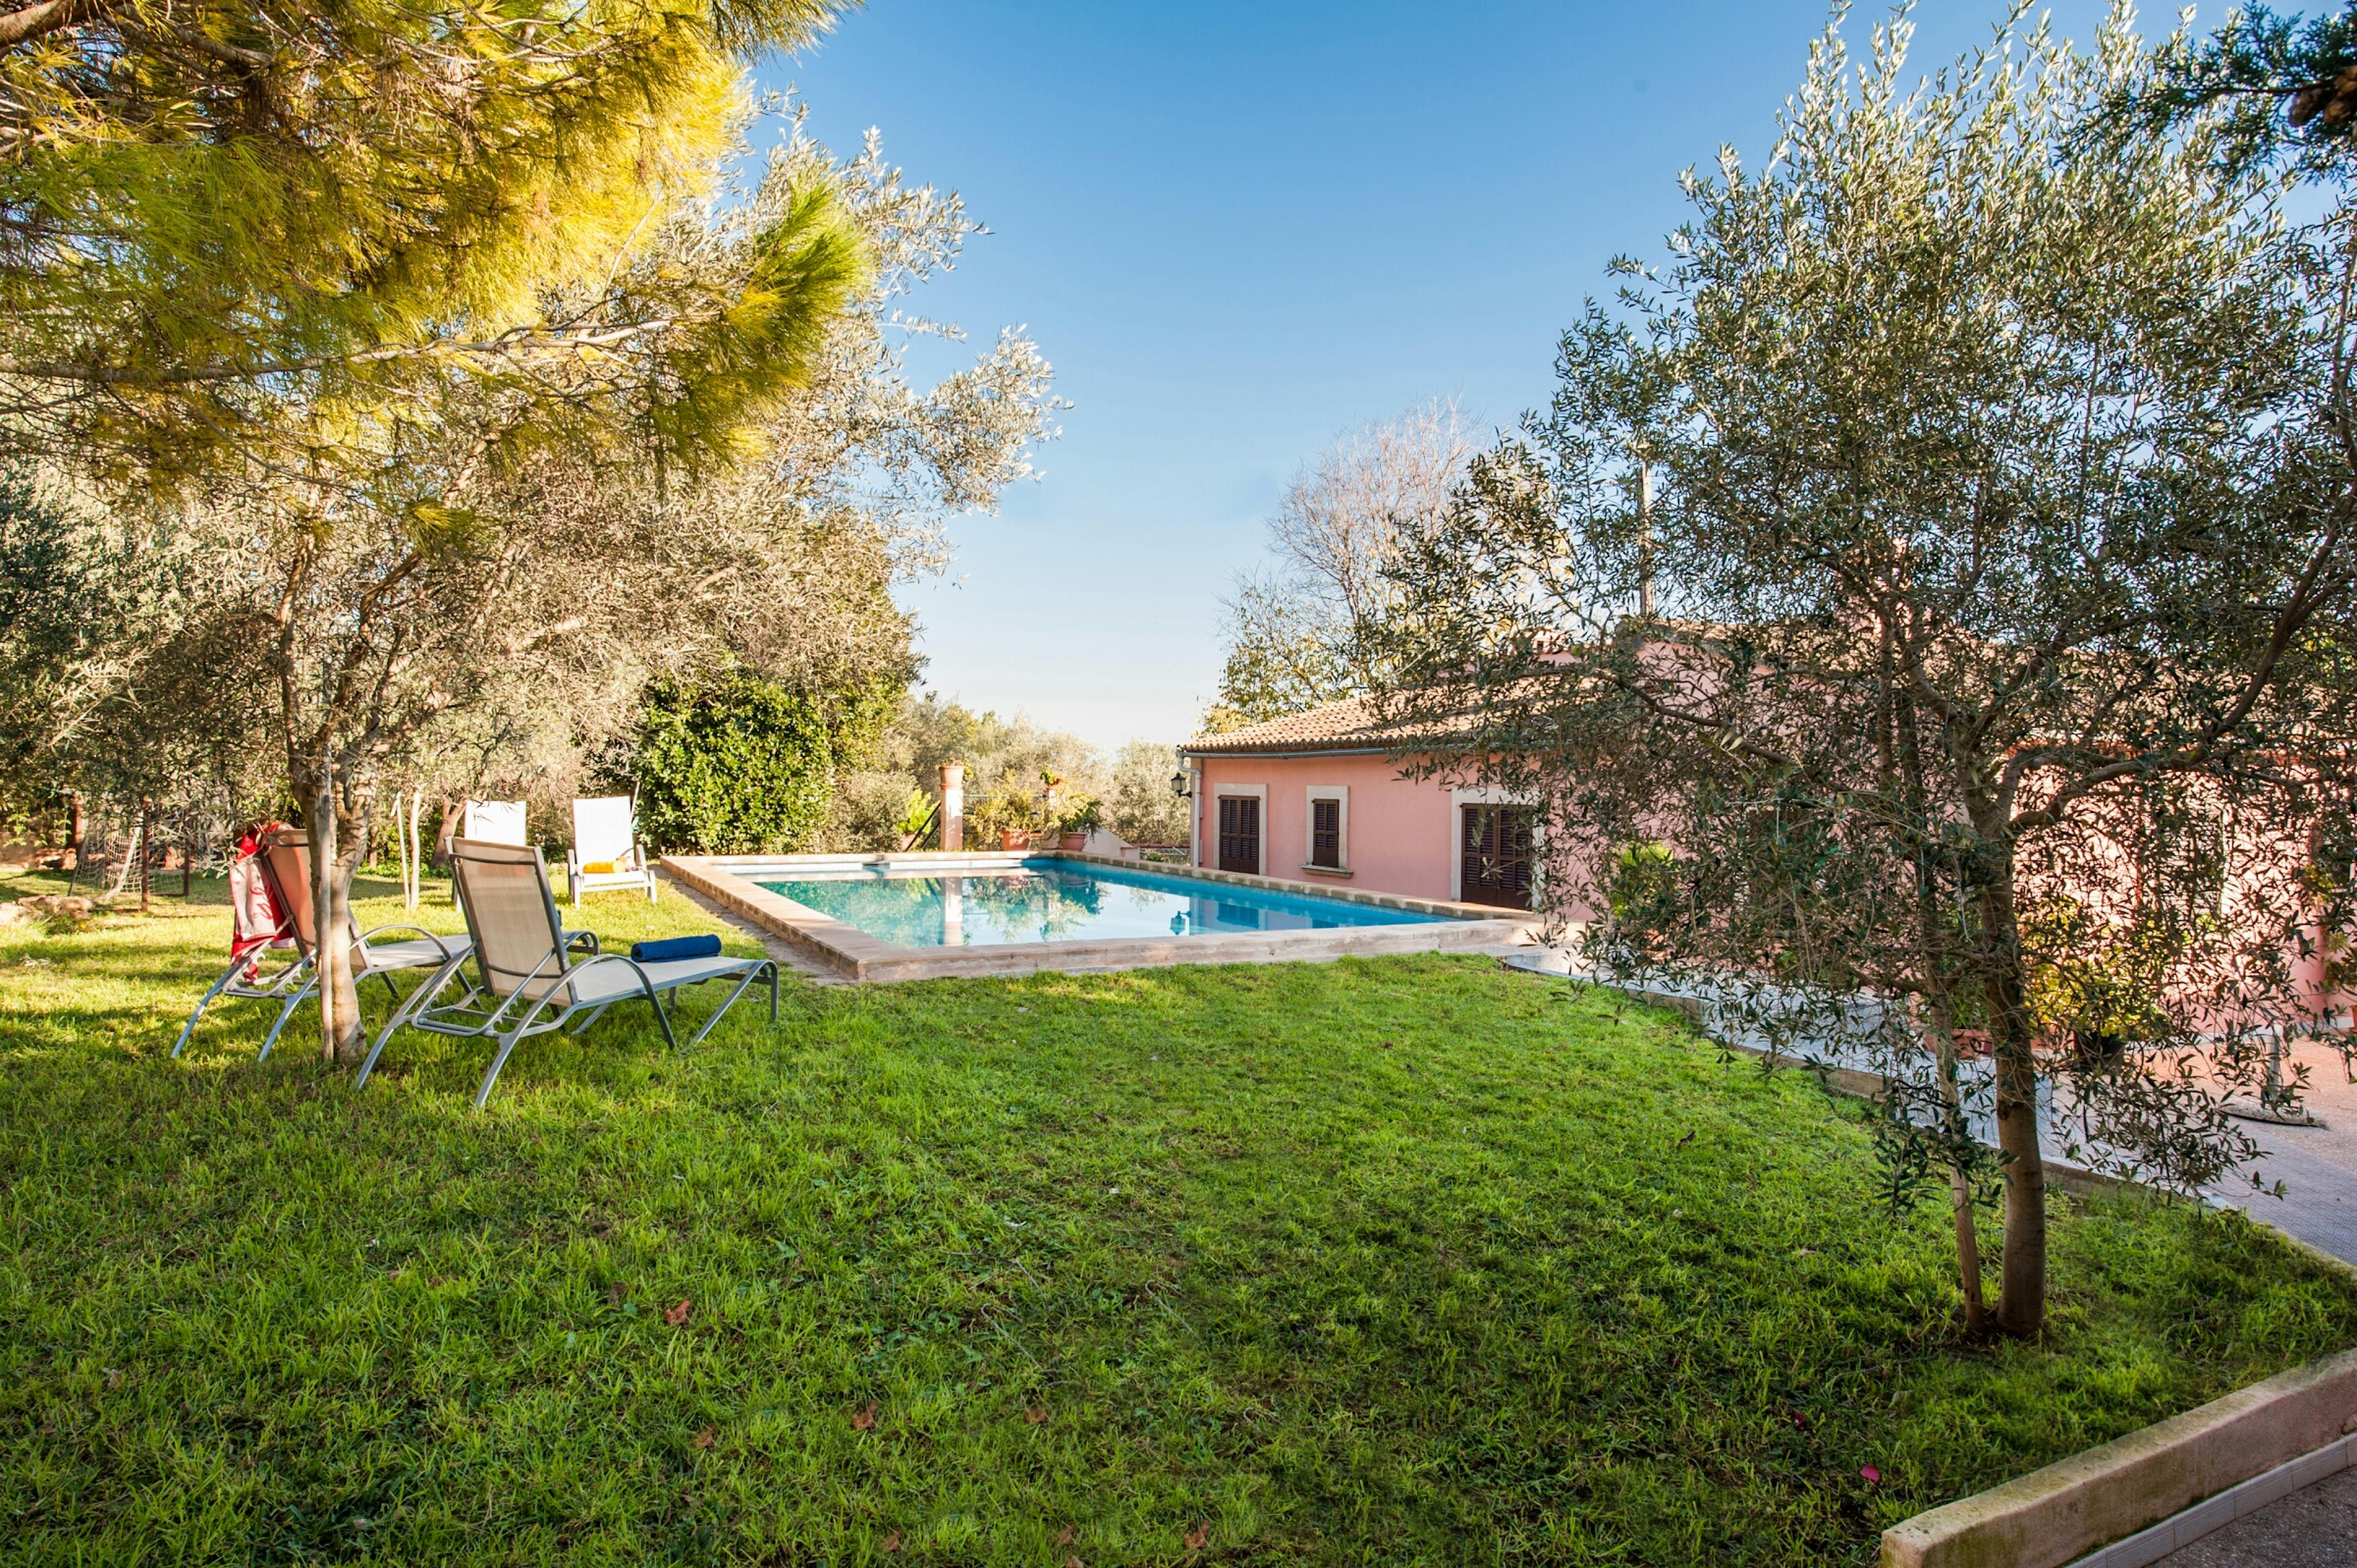 Maison de vacances CA'N LLUC- Alaró- MALLORCA - Kostenloses WLAN (2687507), Alaro, Majorque, Iles Baléares, Espagne, image 10